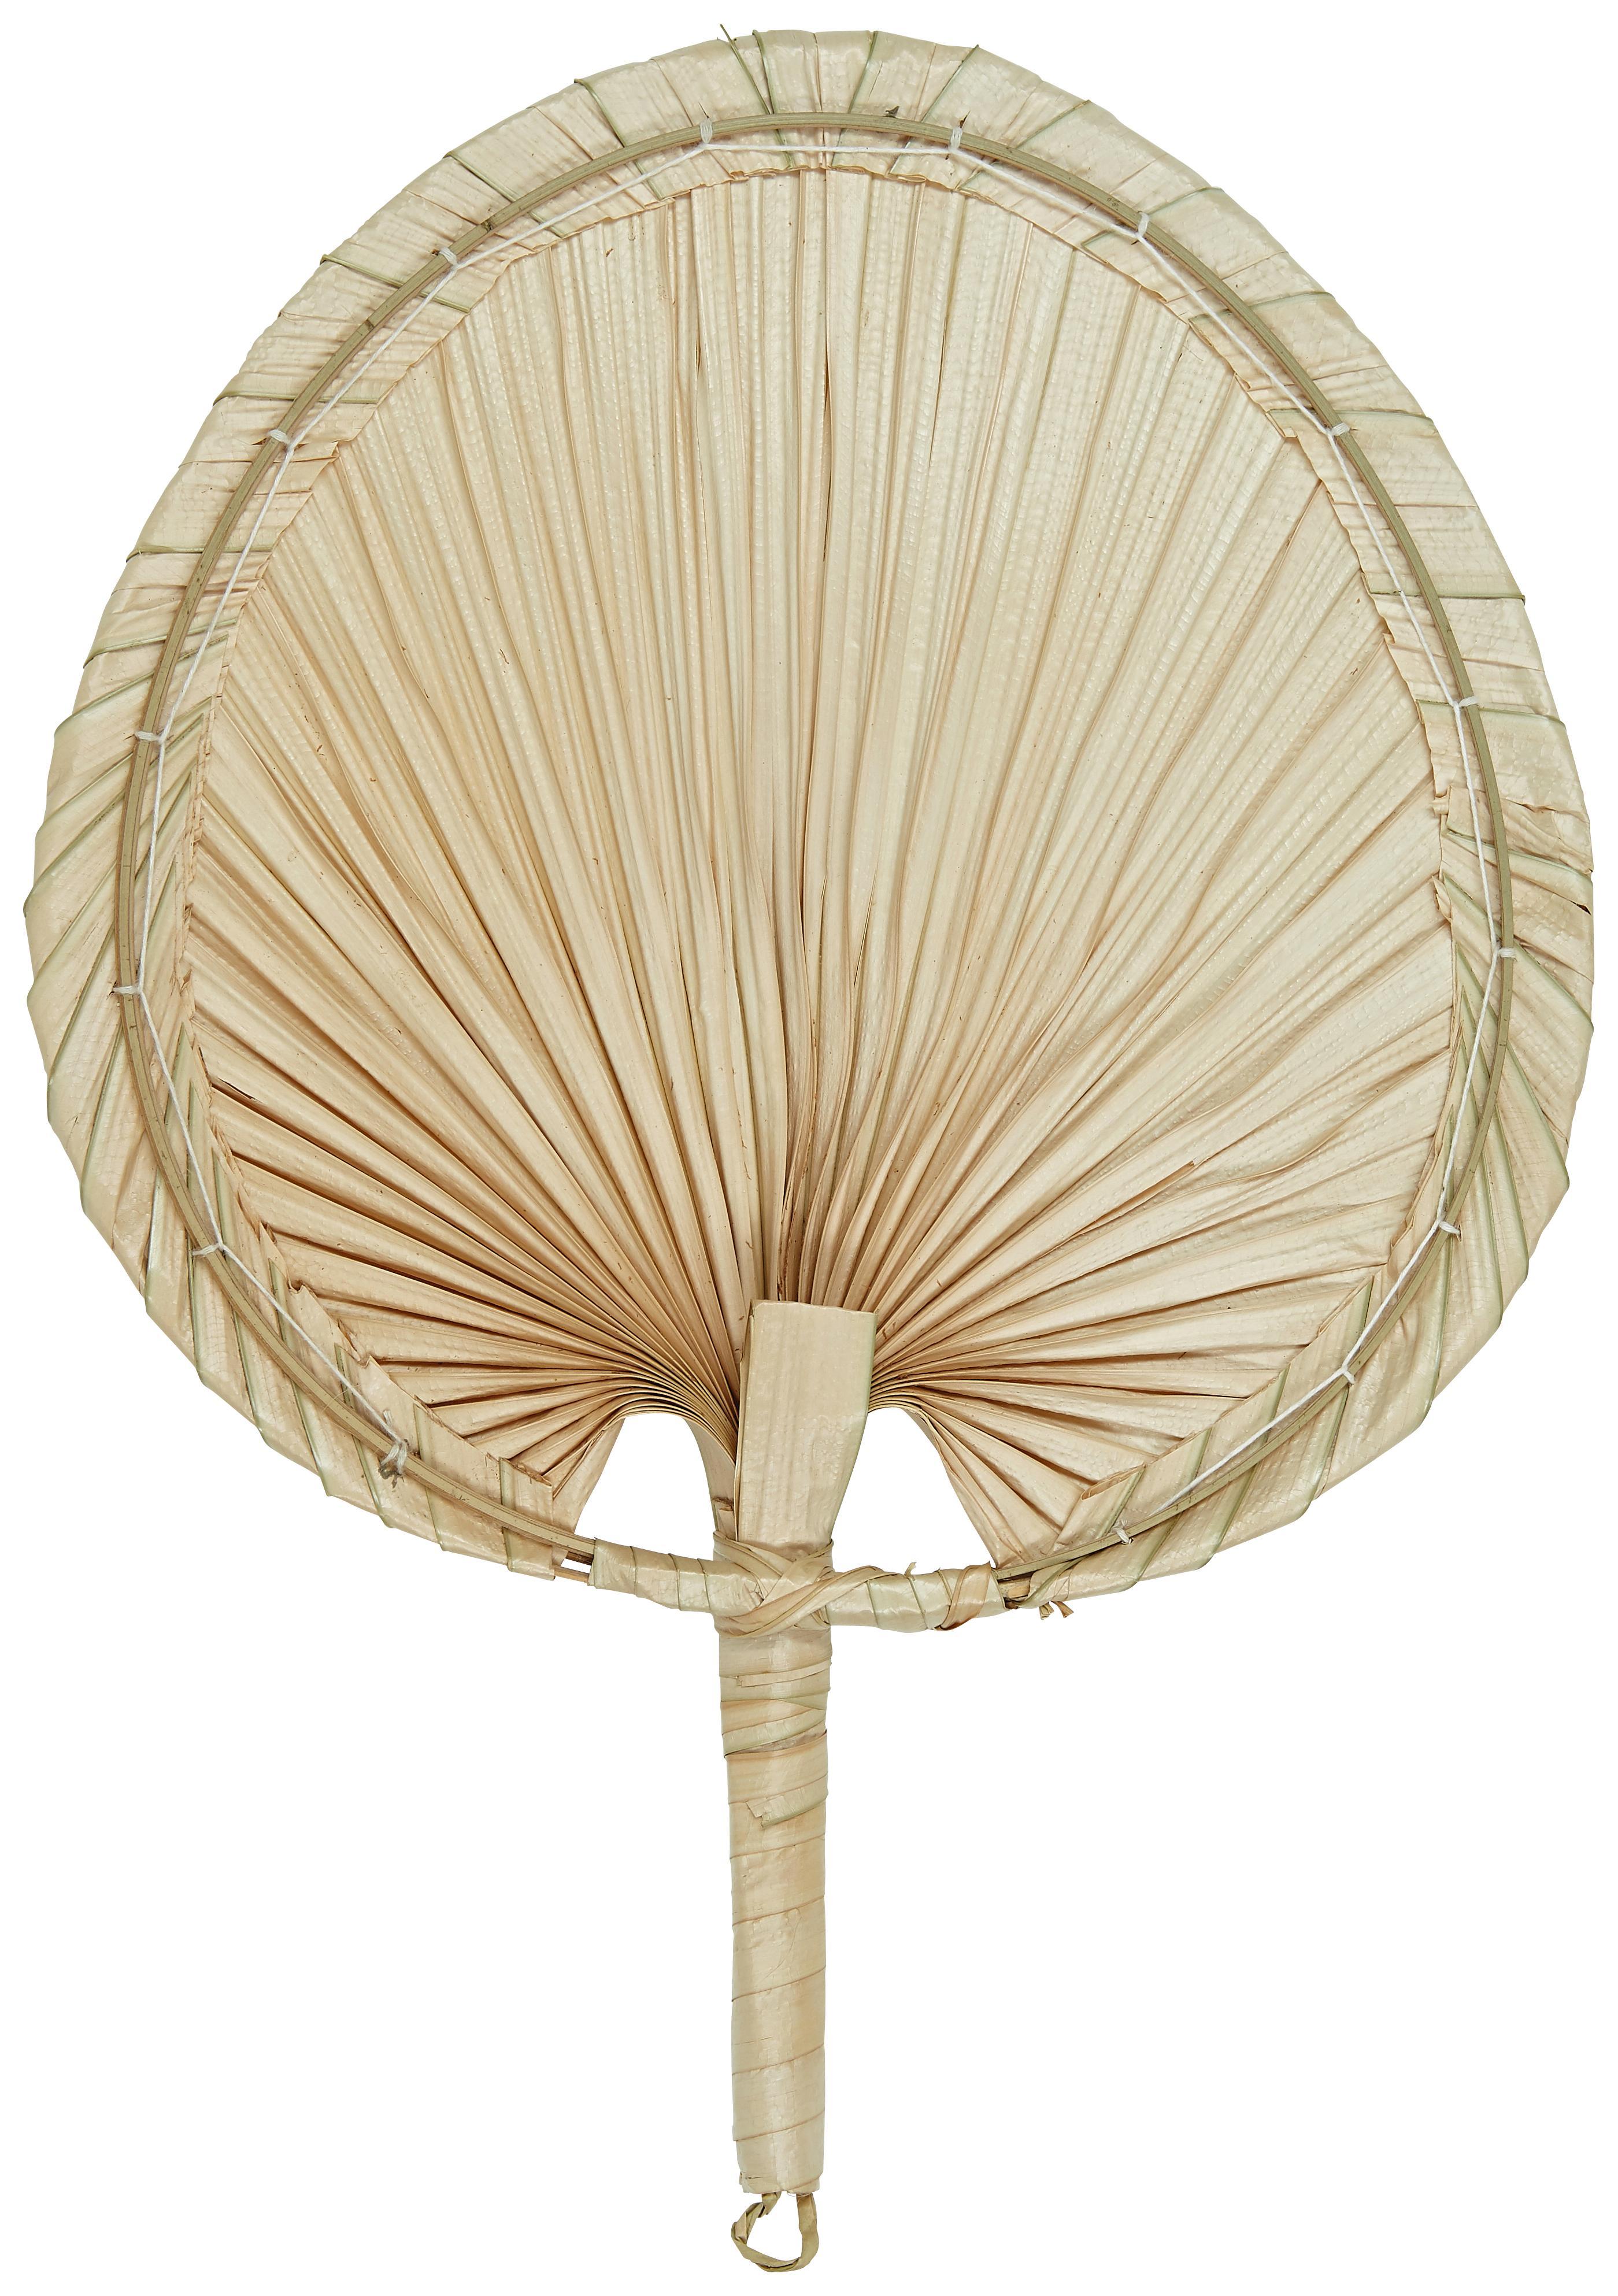 Wandobjekt Seam aus Palmfasern, Palmfasern, Hellbraun, 29 x 37 cm